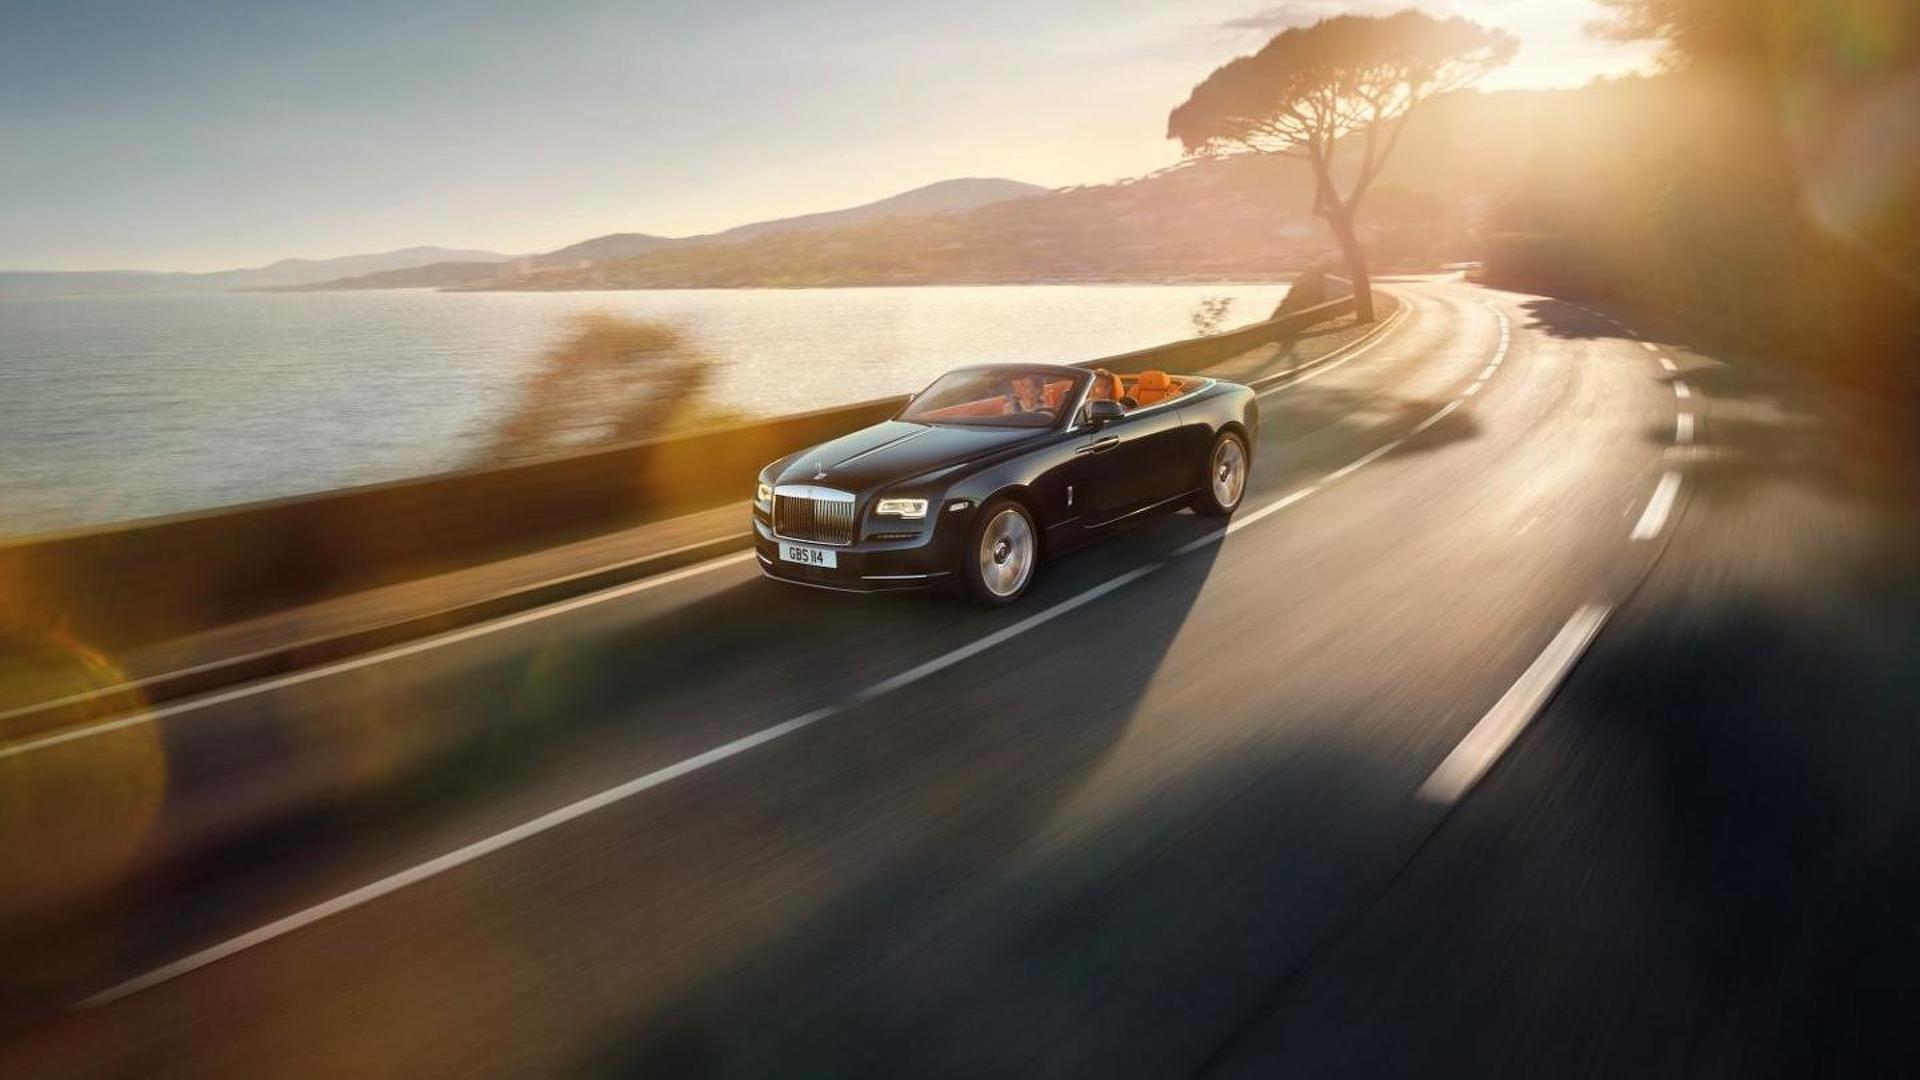 Rolls-Royce Dawn goes official